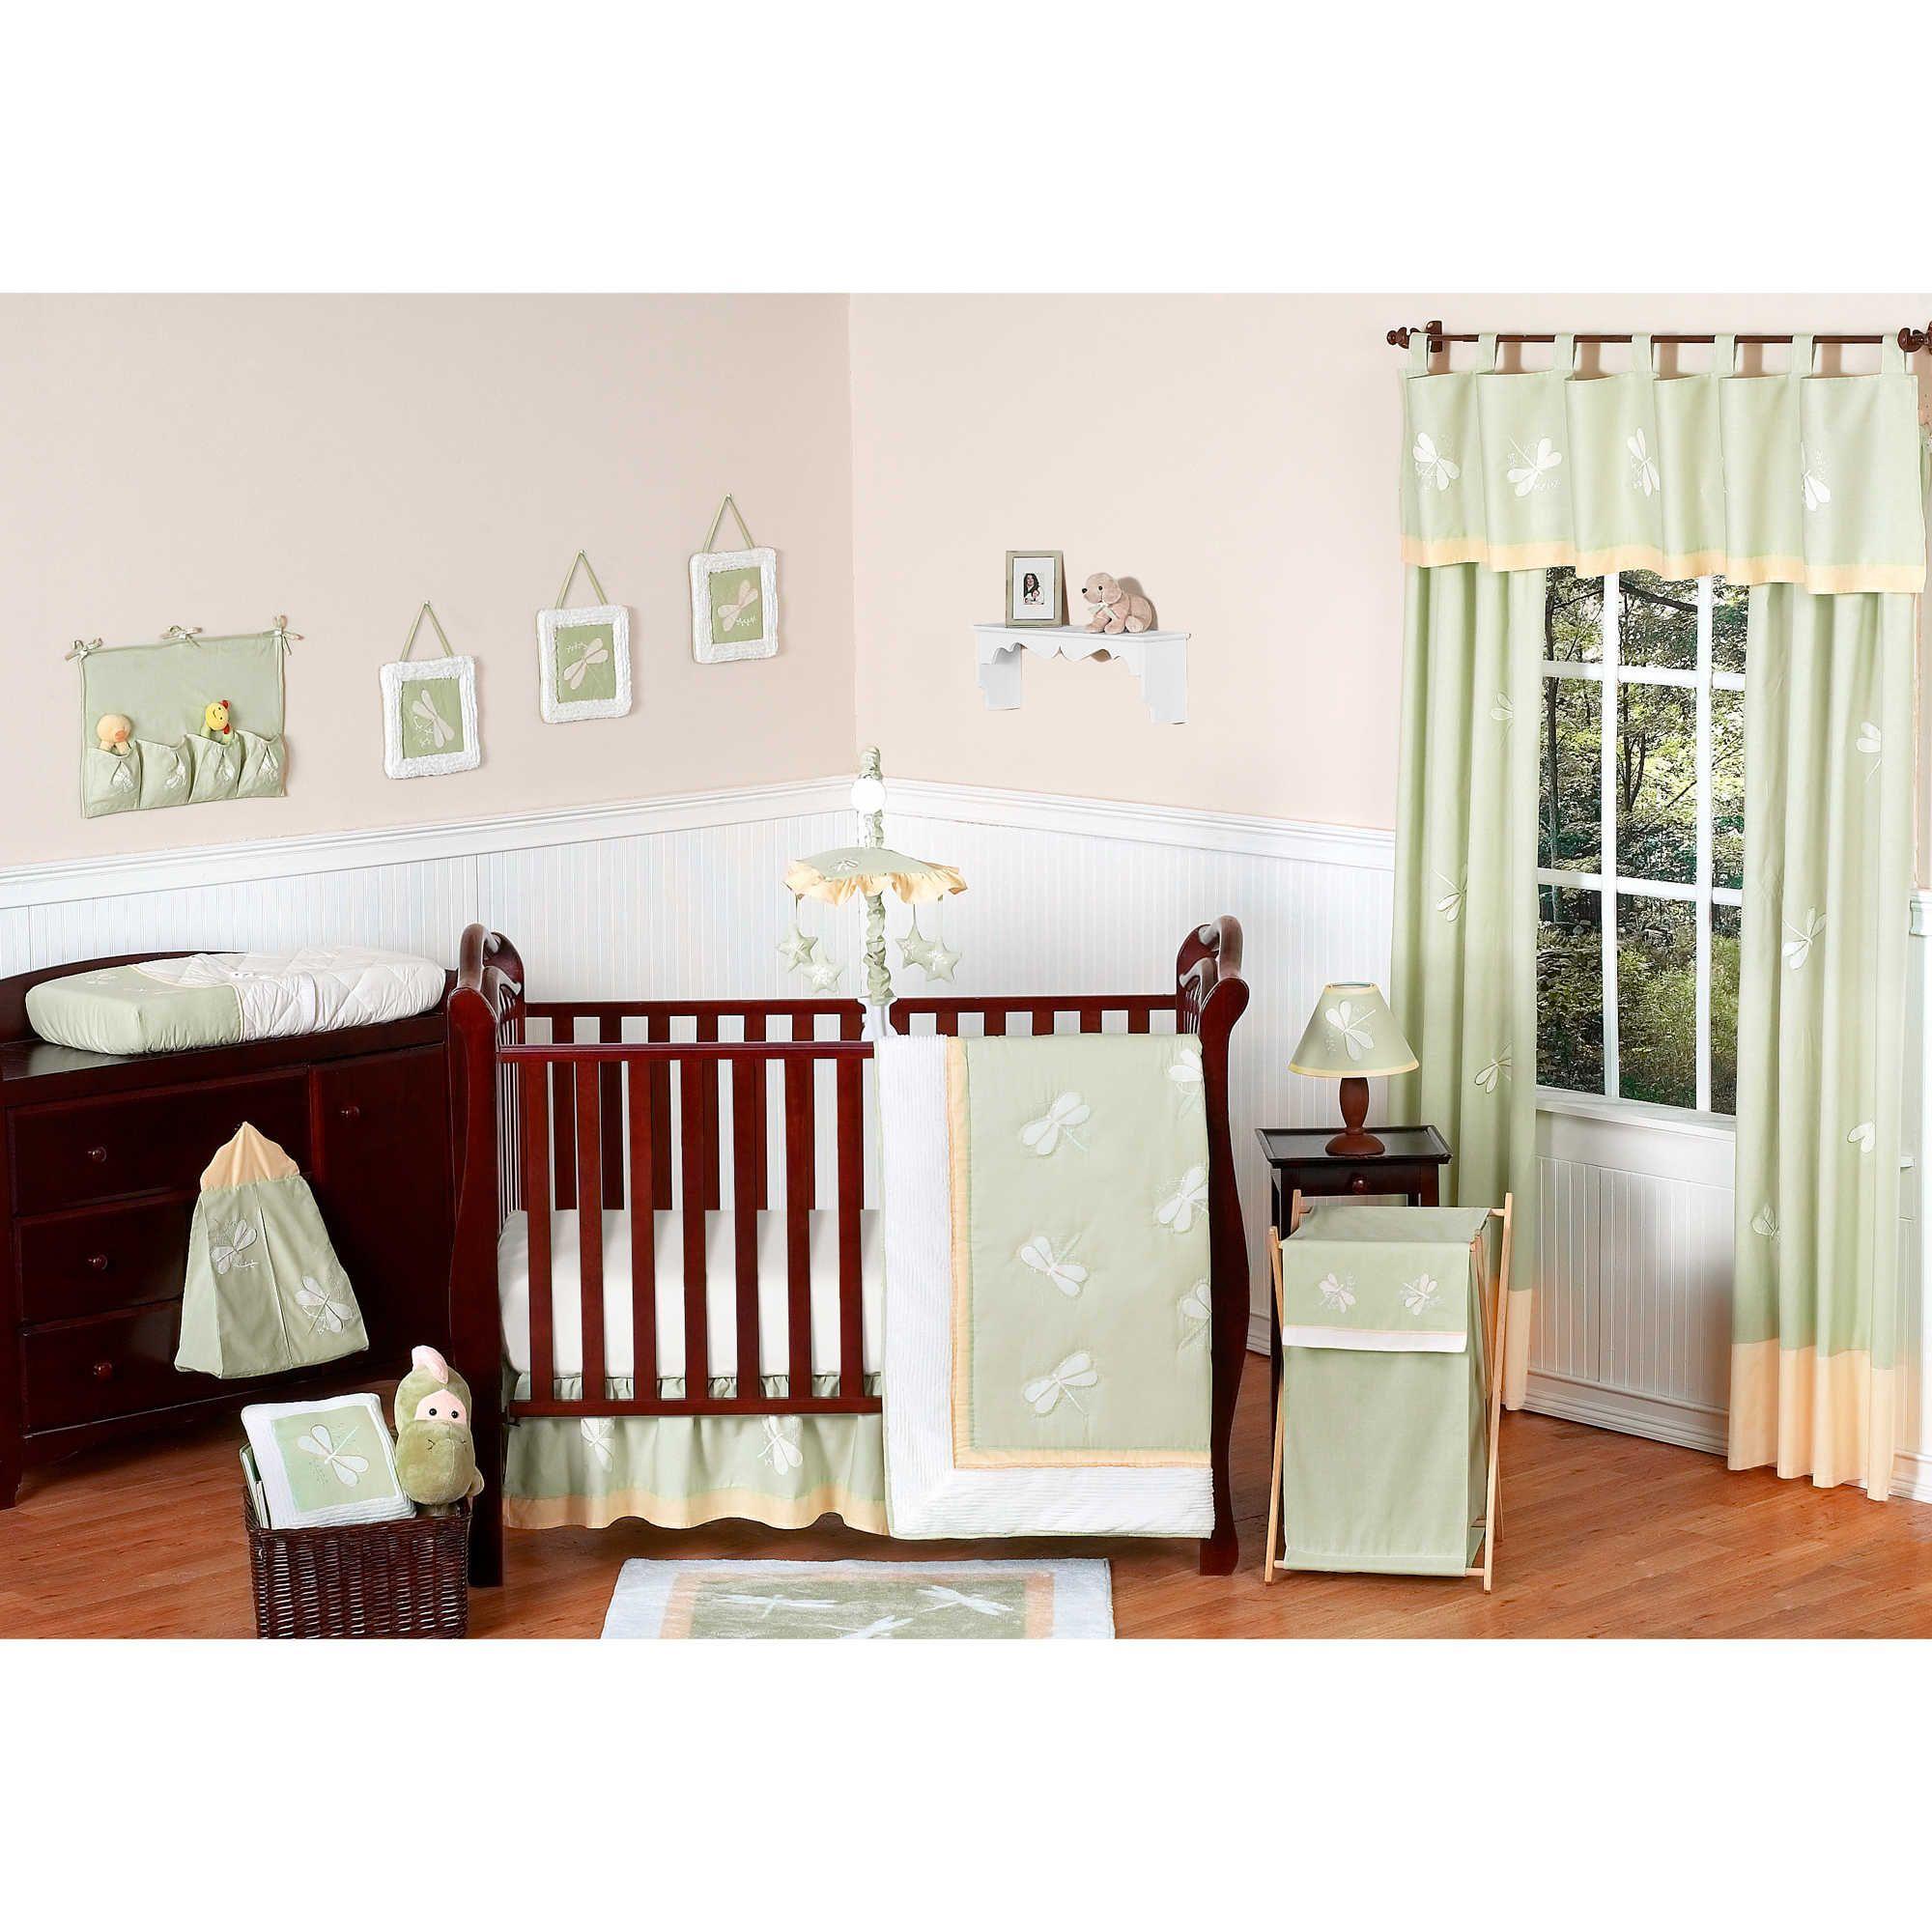 jojo designs bedding getimage shop way url sweet crib cribs your suzanna set com net ostkcdn piece shld